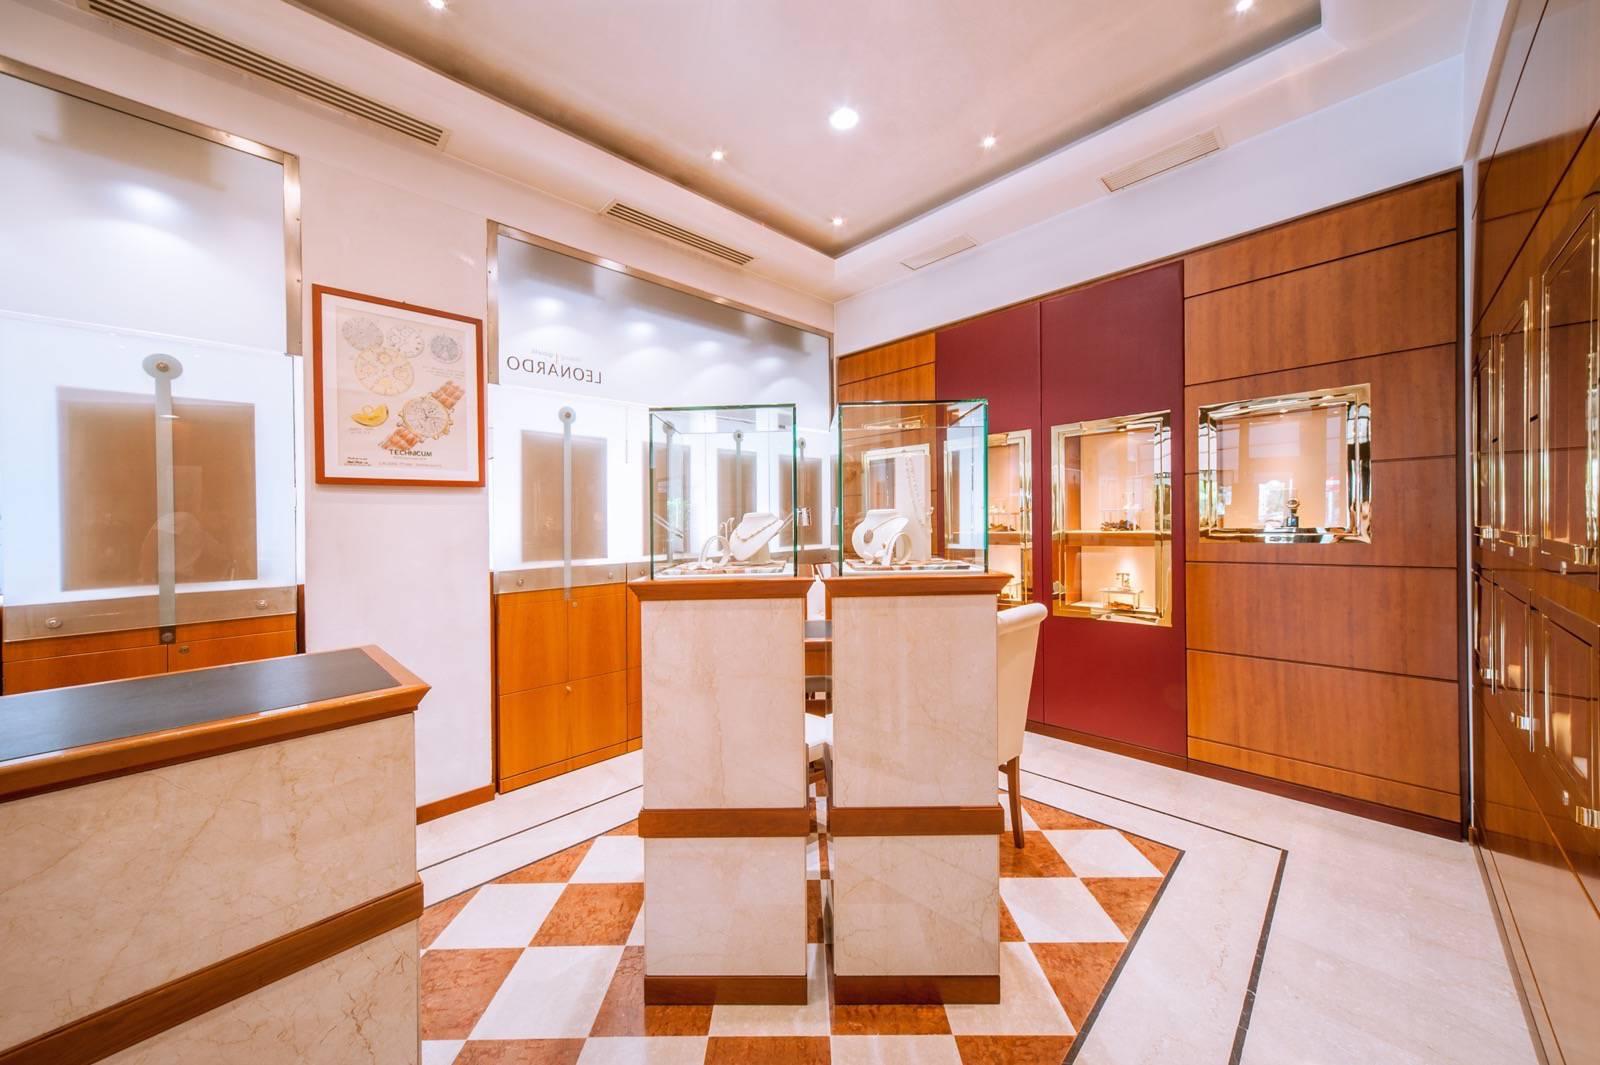 gioielli-leonardo-gioielleria-mestre-venezia-7